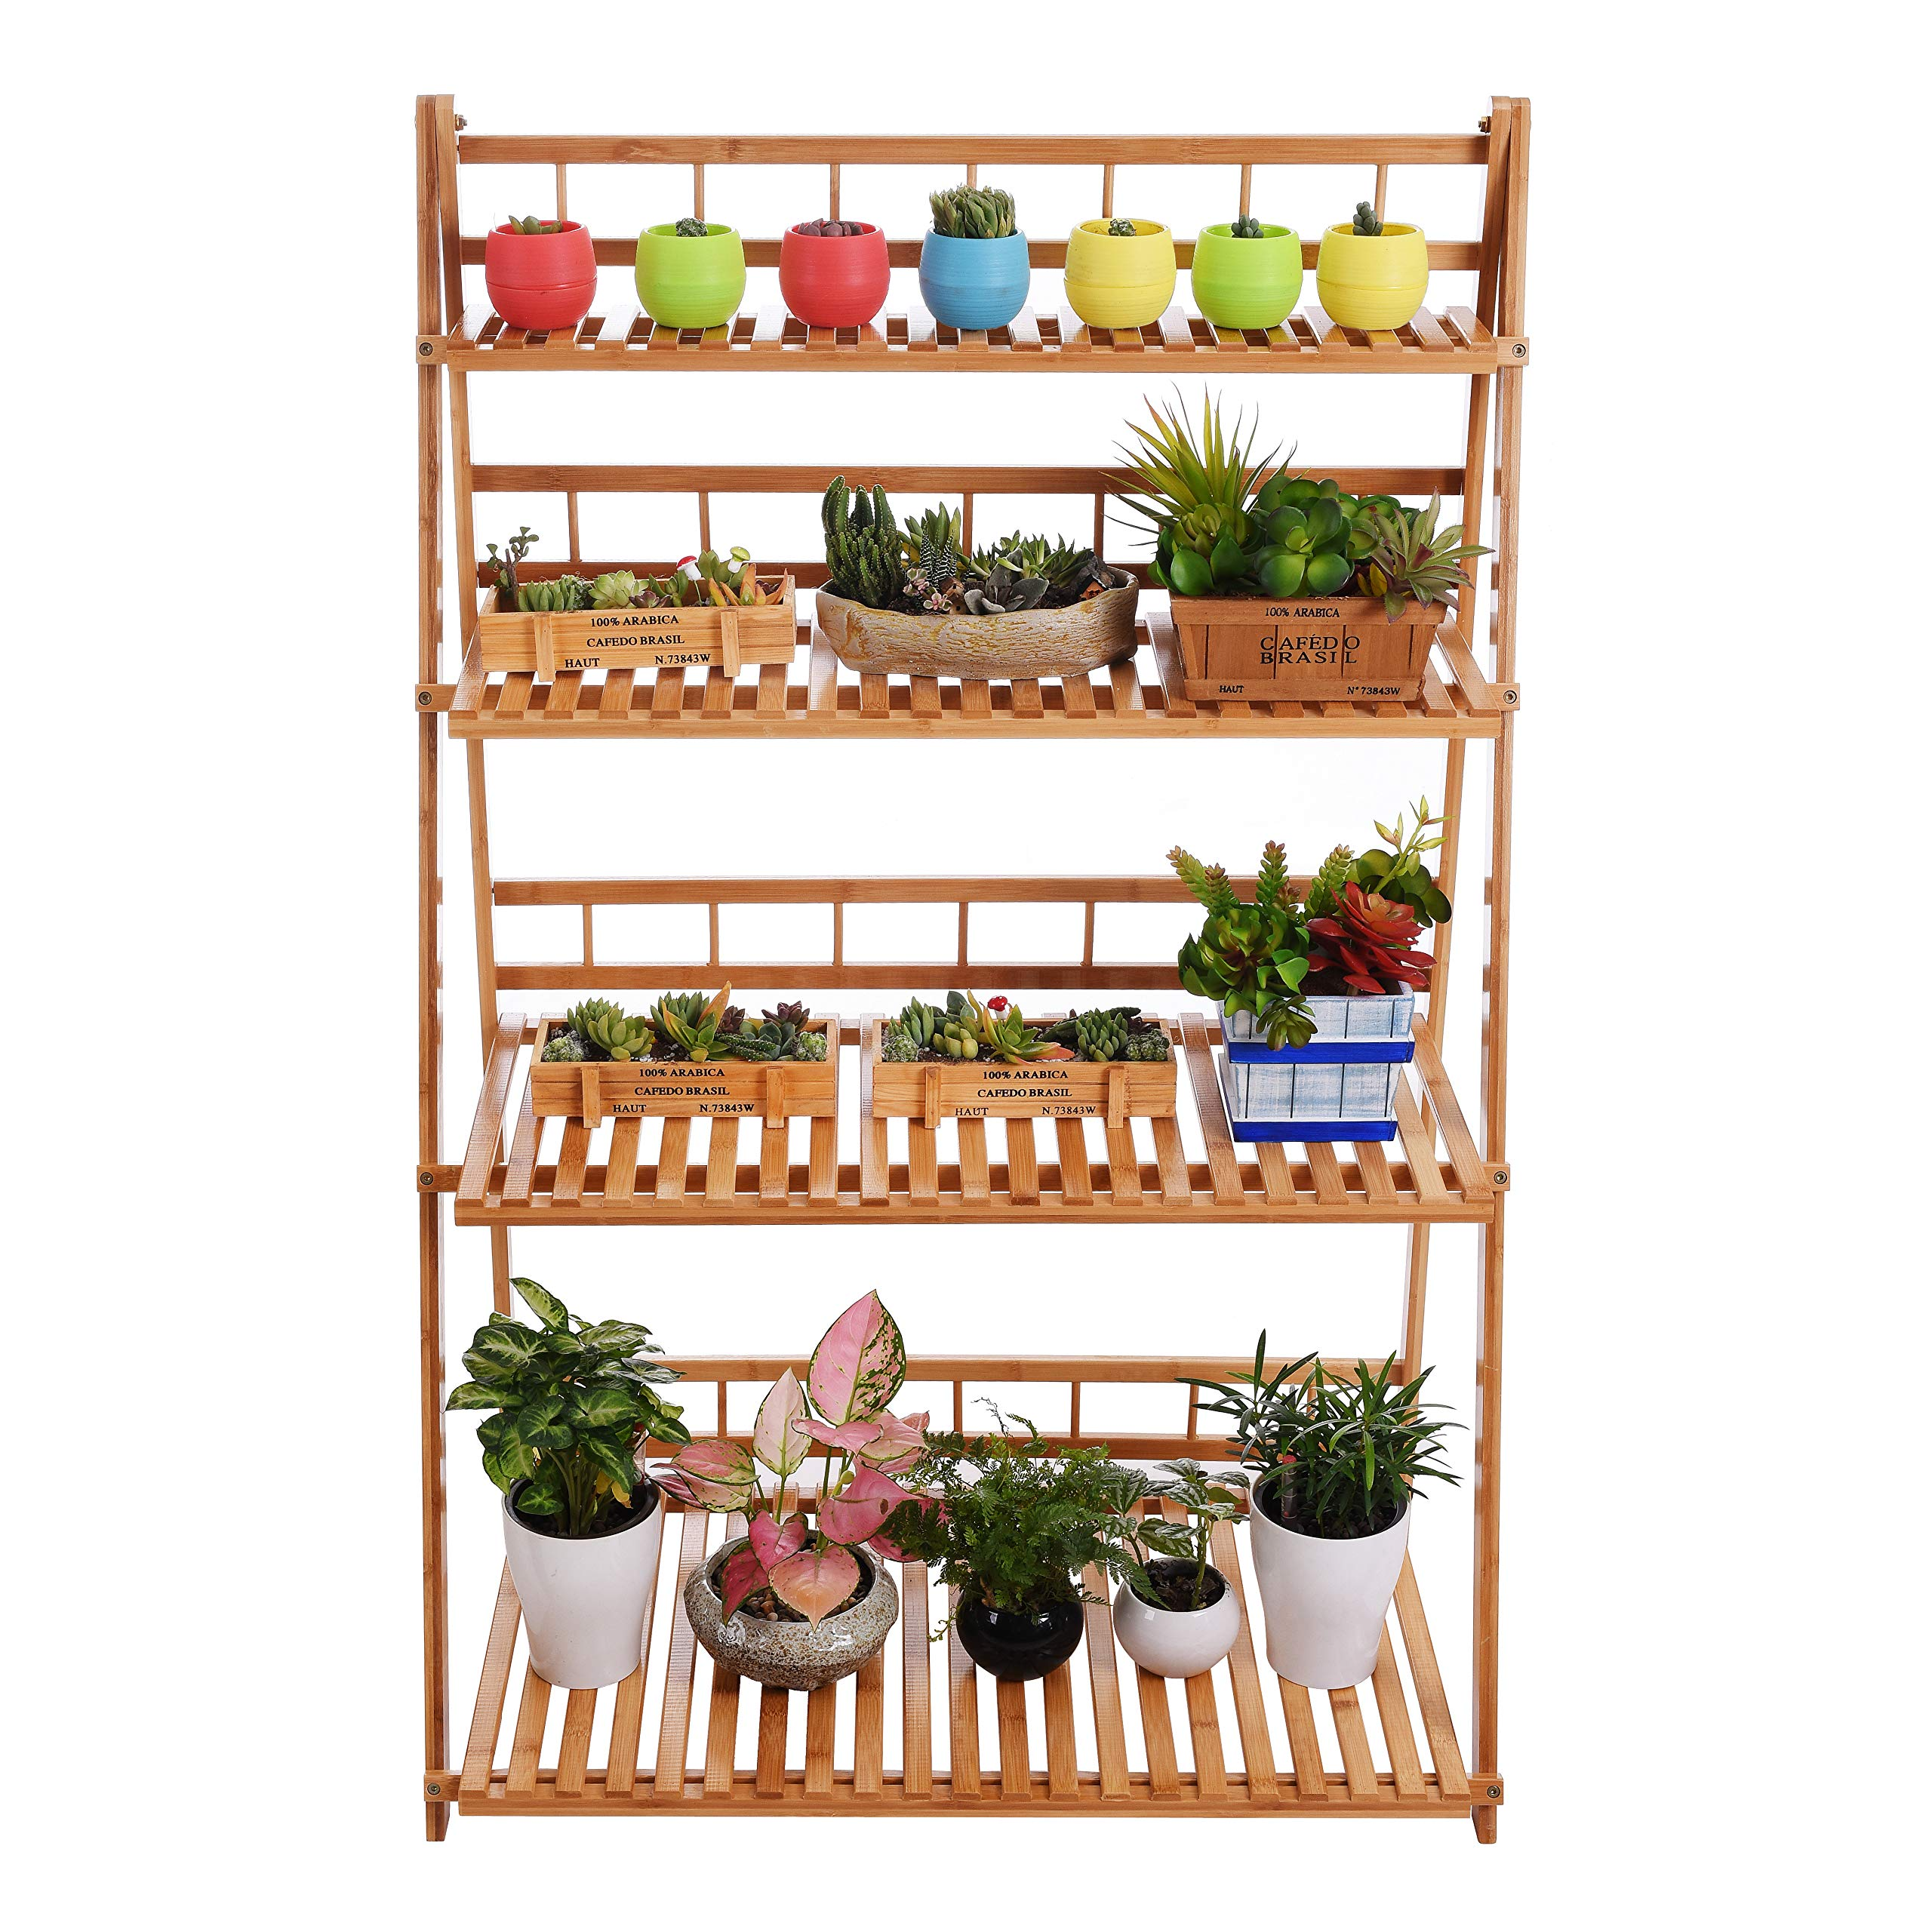 Plant Flower Stand Plant Display Shelf Rack Shelf Bamboo Foldable Pot Racks Planter Storage Rack Display Shelving Unit by MUGIAZII